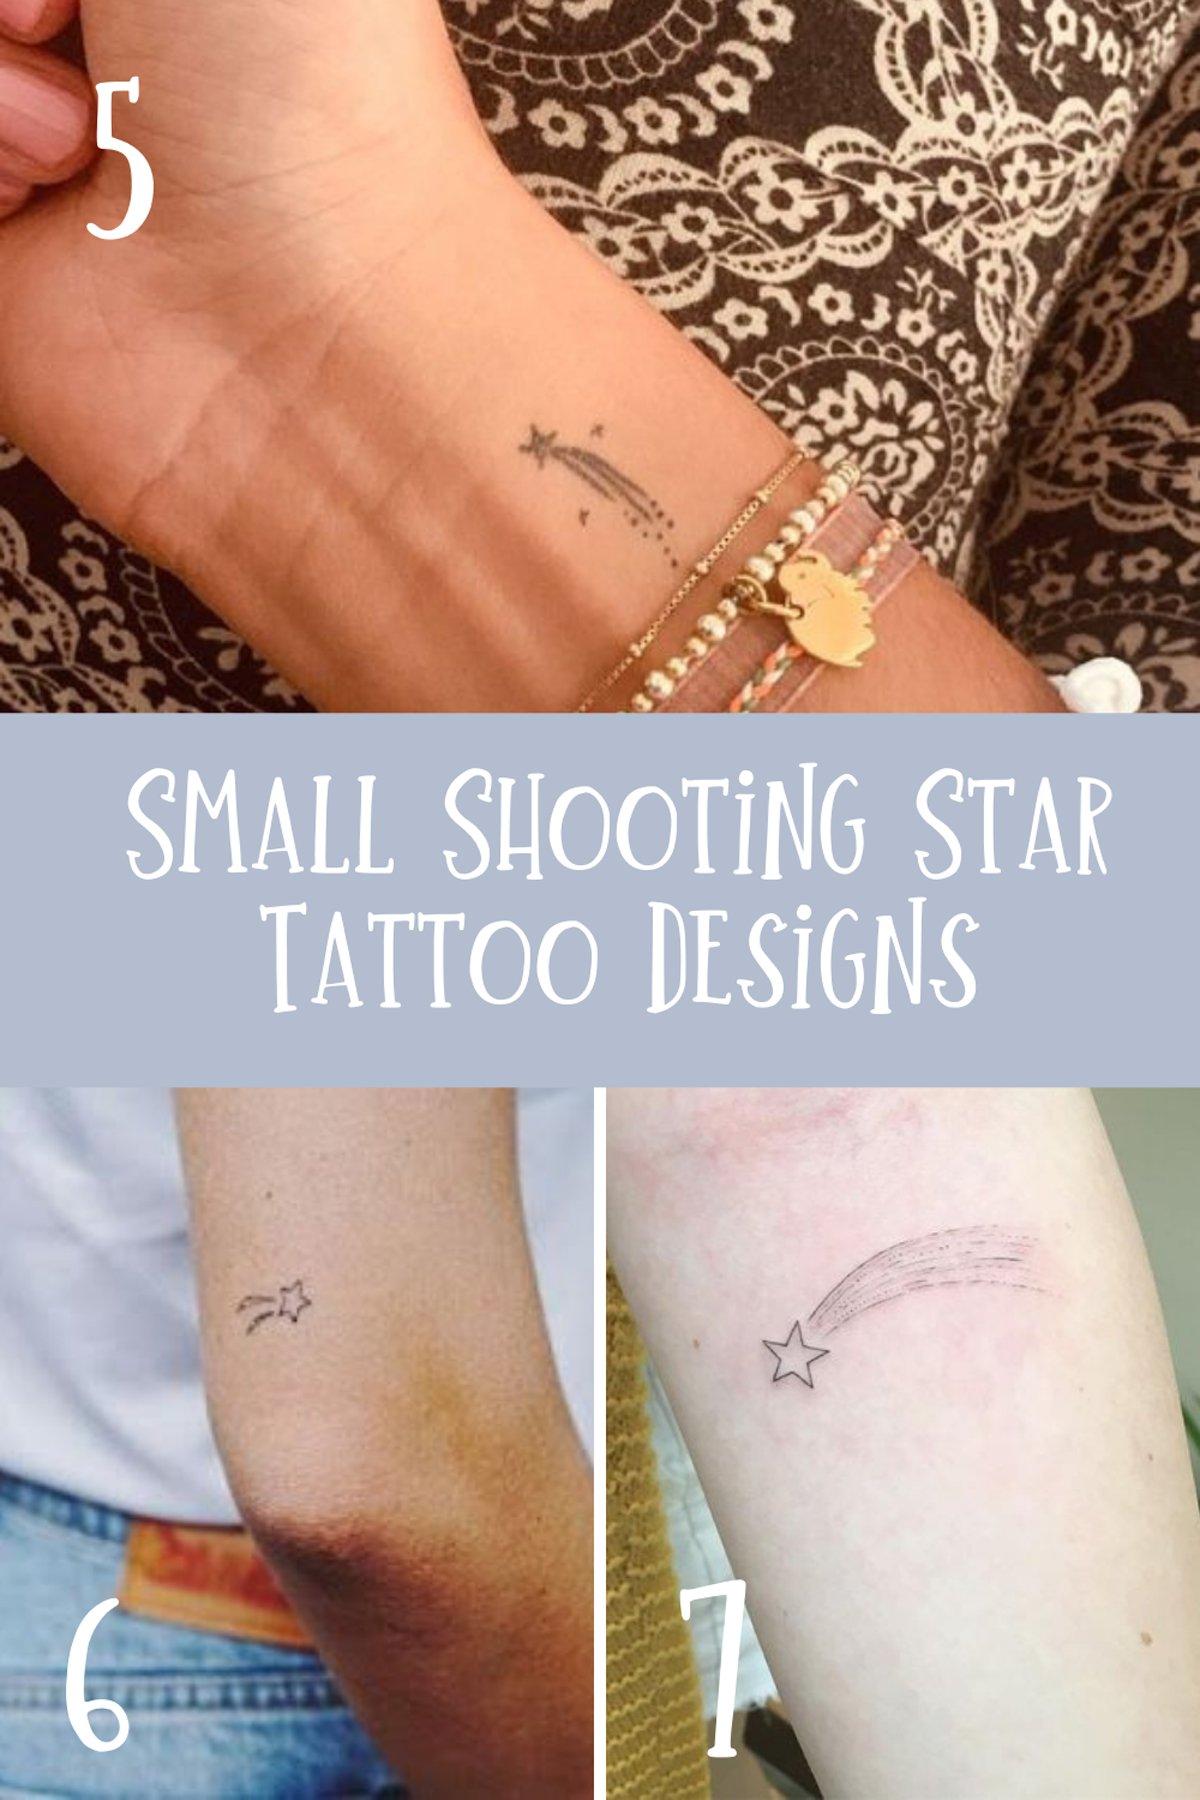 Small Shooting Star Design